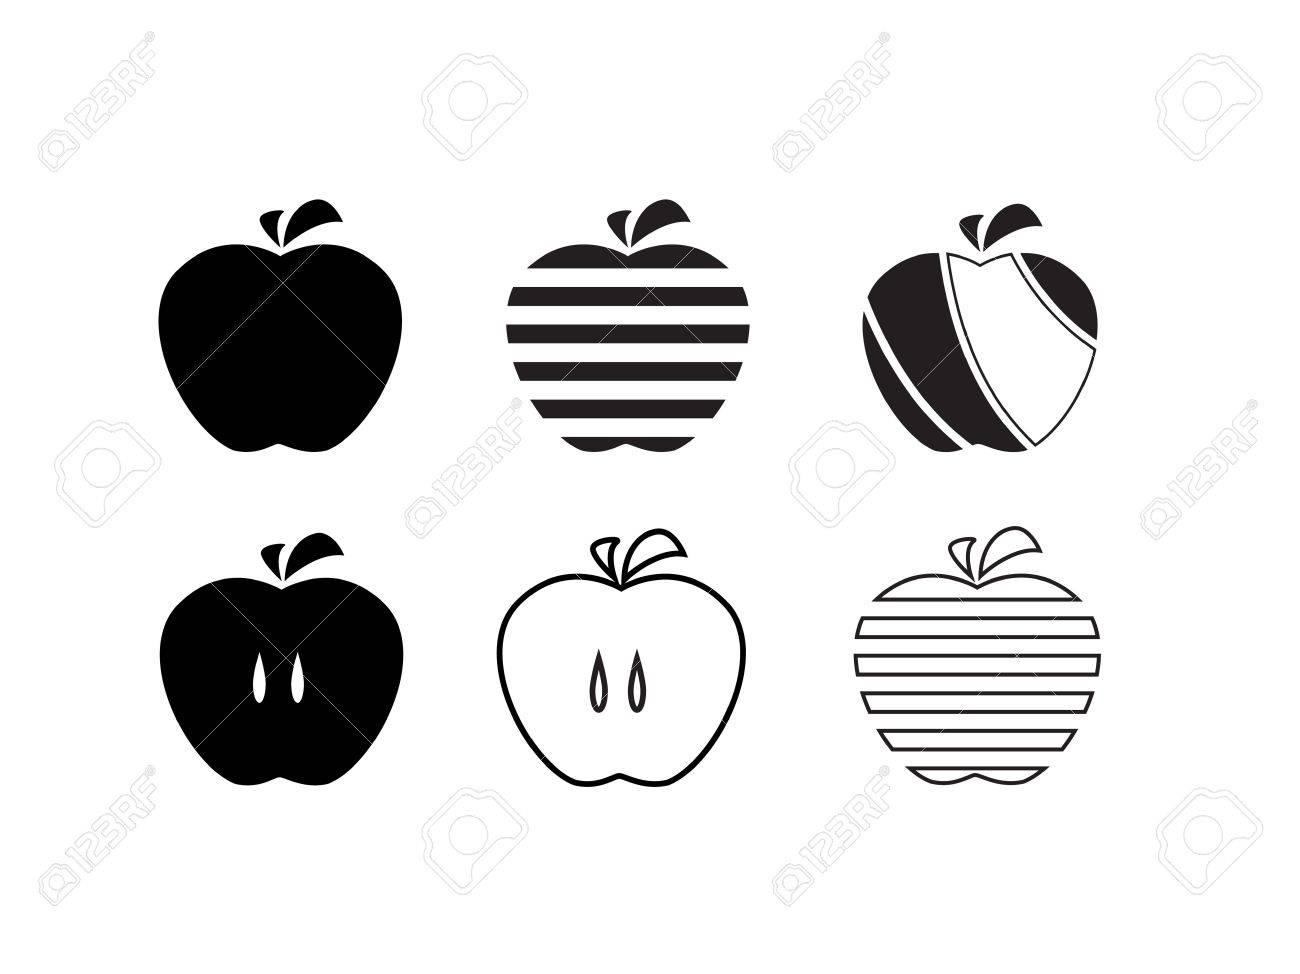 Apple icons set  Stylized fruit design elements  Black silhouette